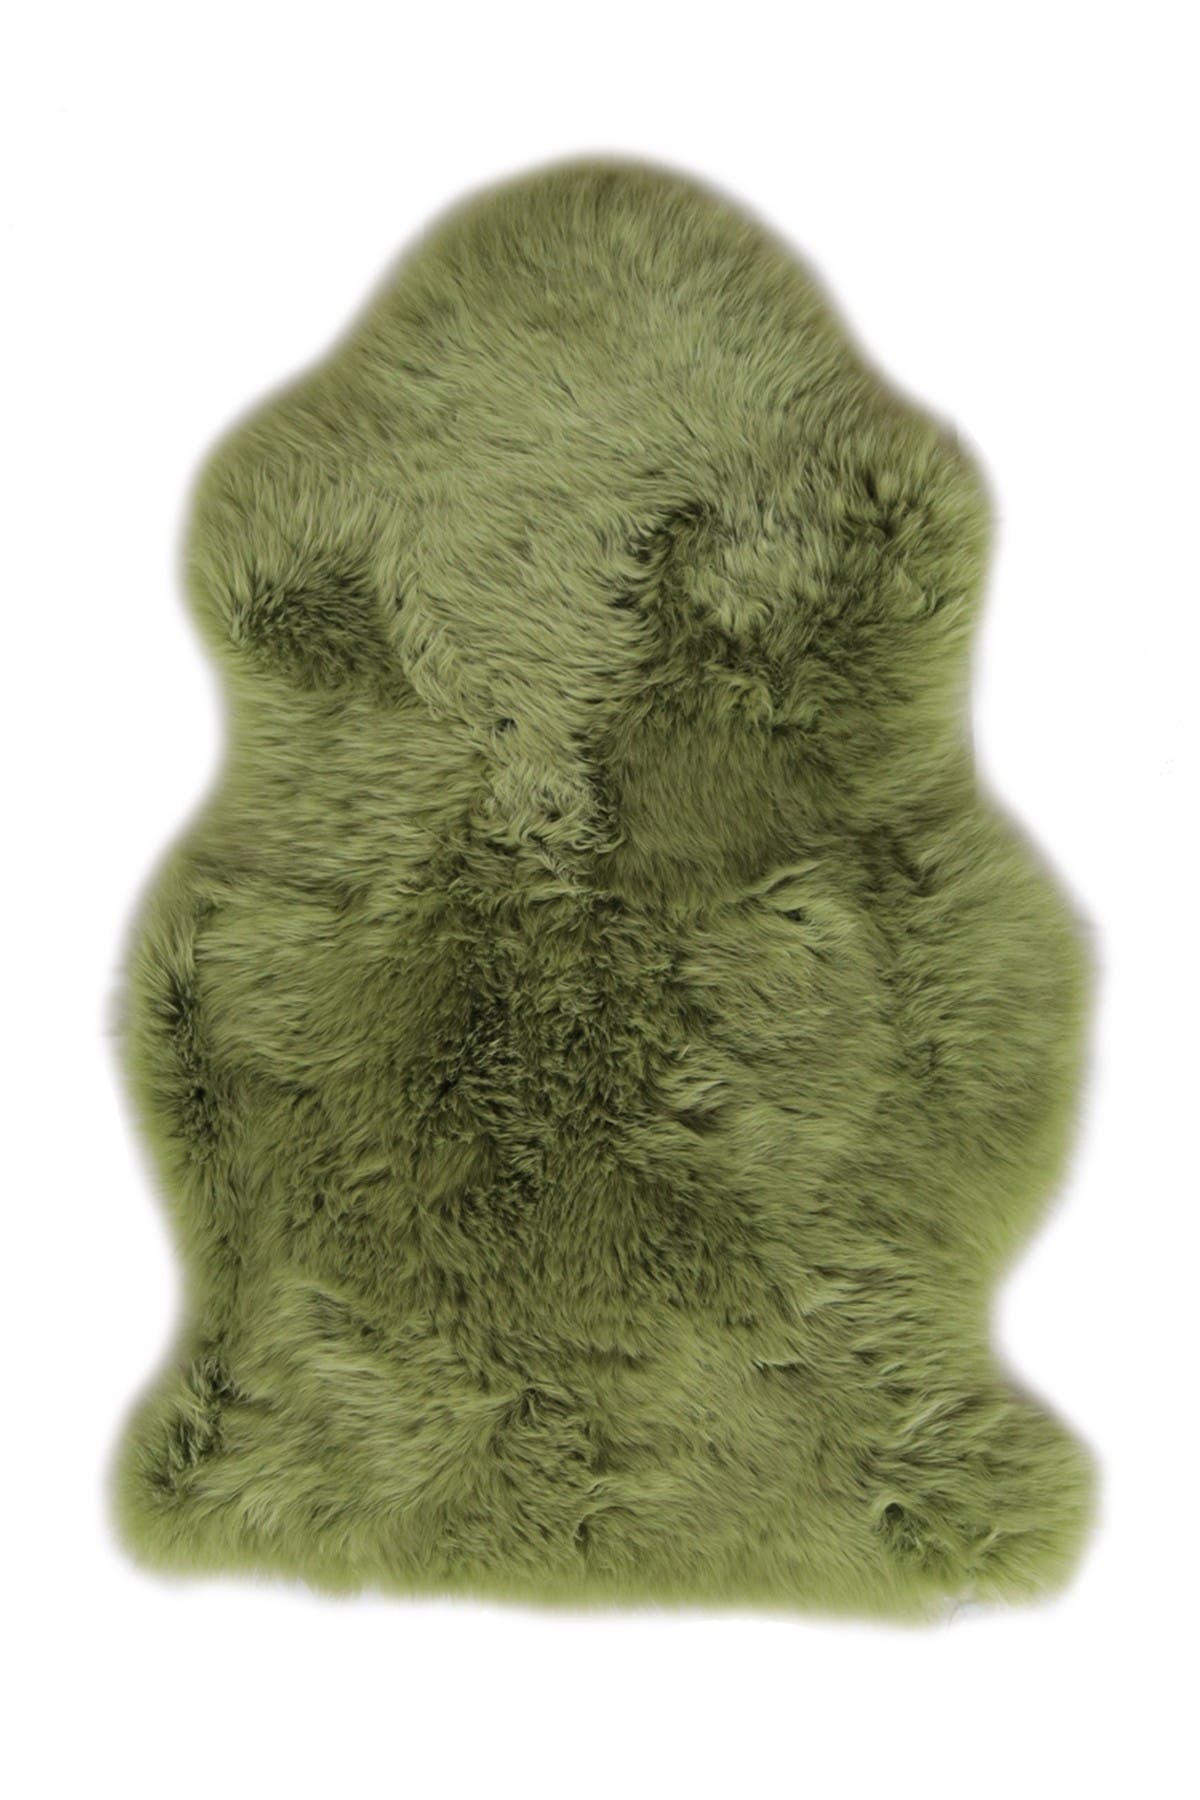 Image of Natural Milan Genuine Sheepskin Shearling Rug - 2ft x 3ft - Lime